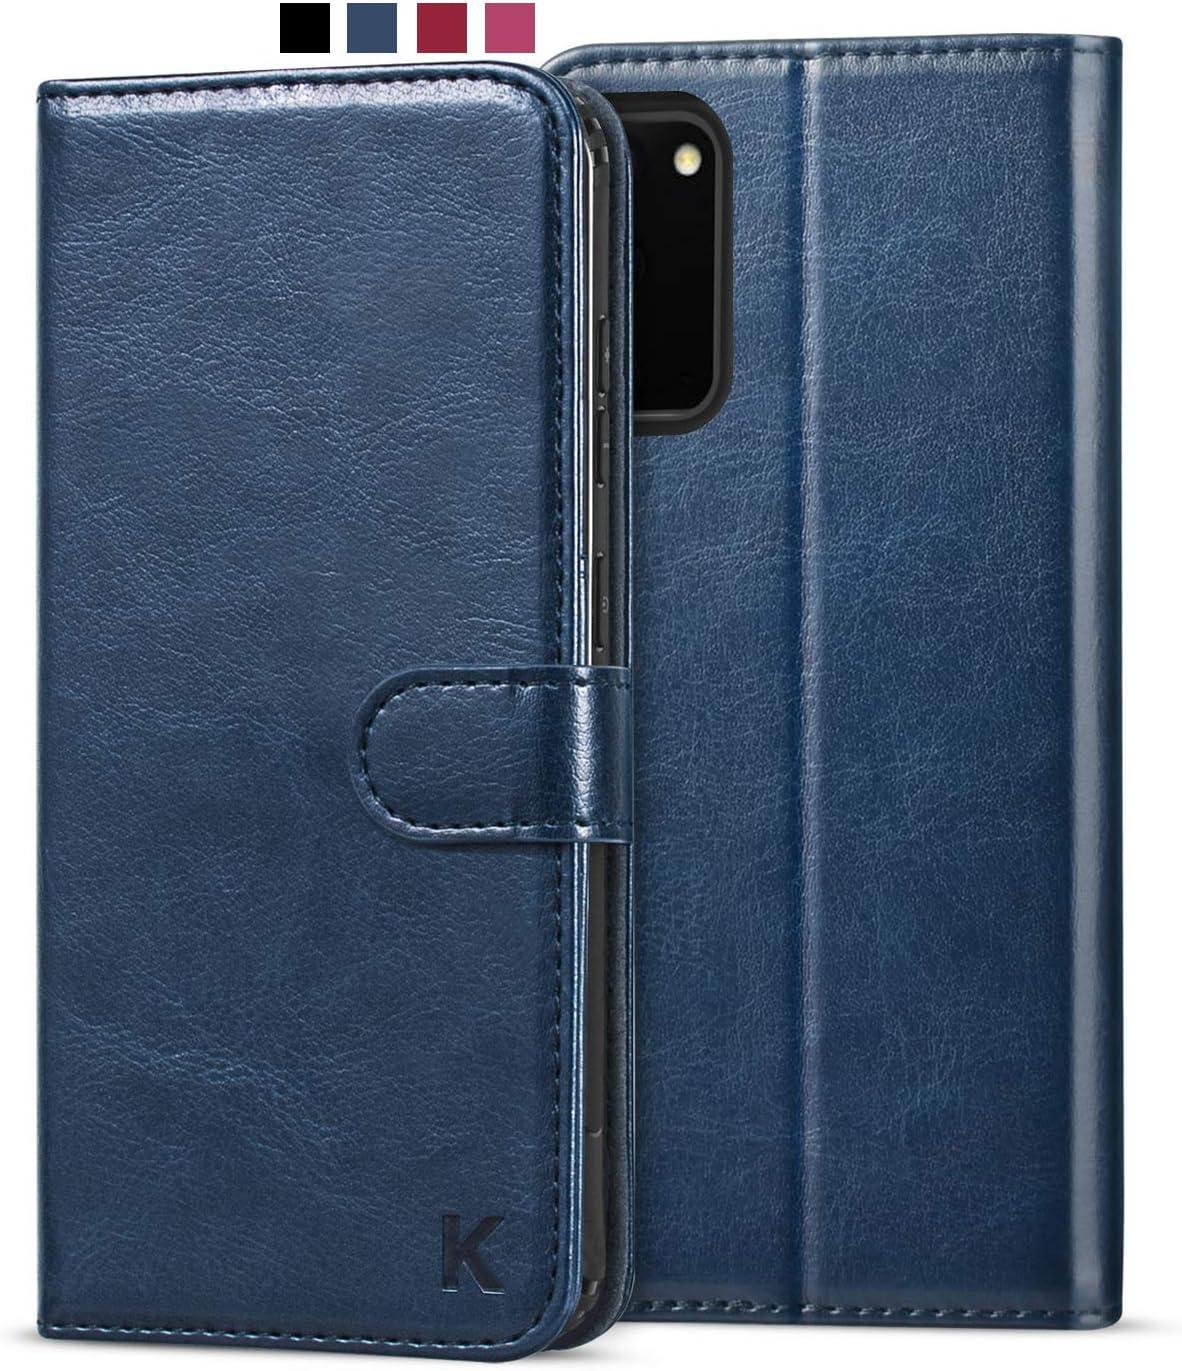 KILINO Samsung Galaxy S20 Wallet Case [PU Leather] [Soft TPU] [RFID Blocking] [Shock-Absorbent Bumper] [Card Slots] [Kickstand] [Magnetic Closure] Flip Folio Cover (Navy Blue)